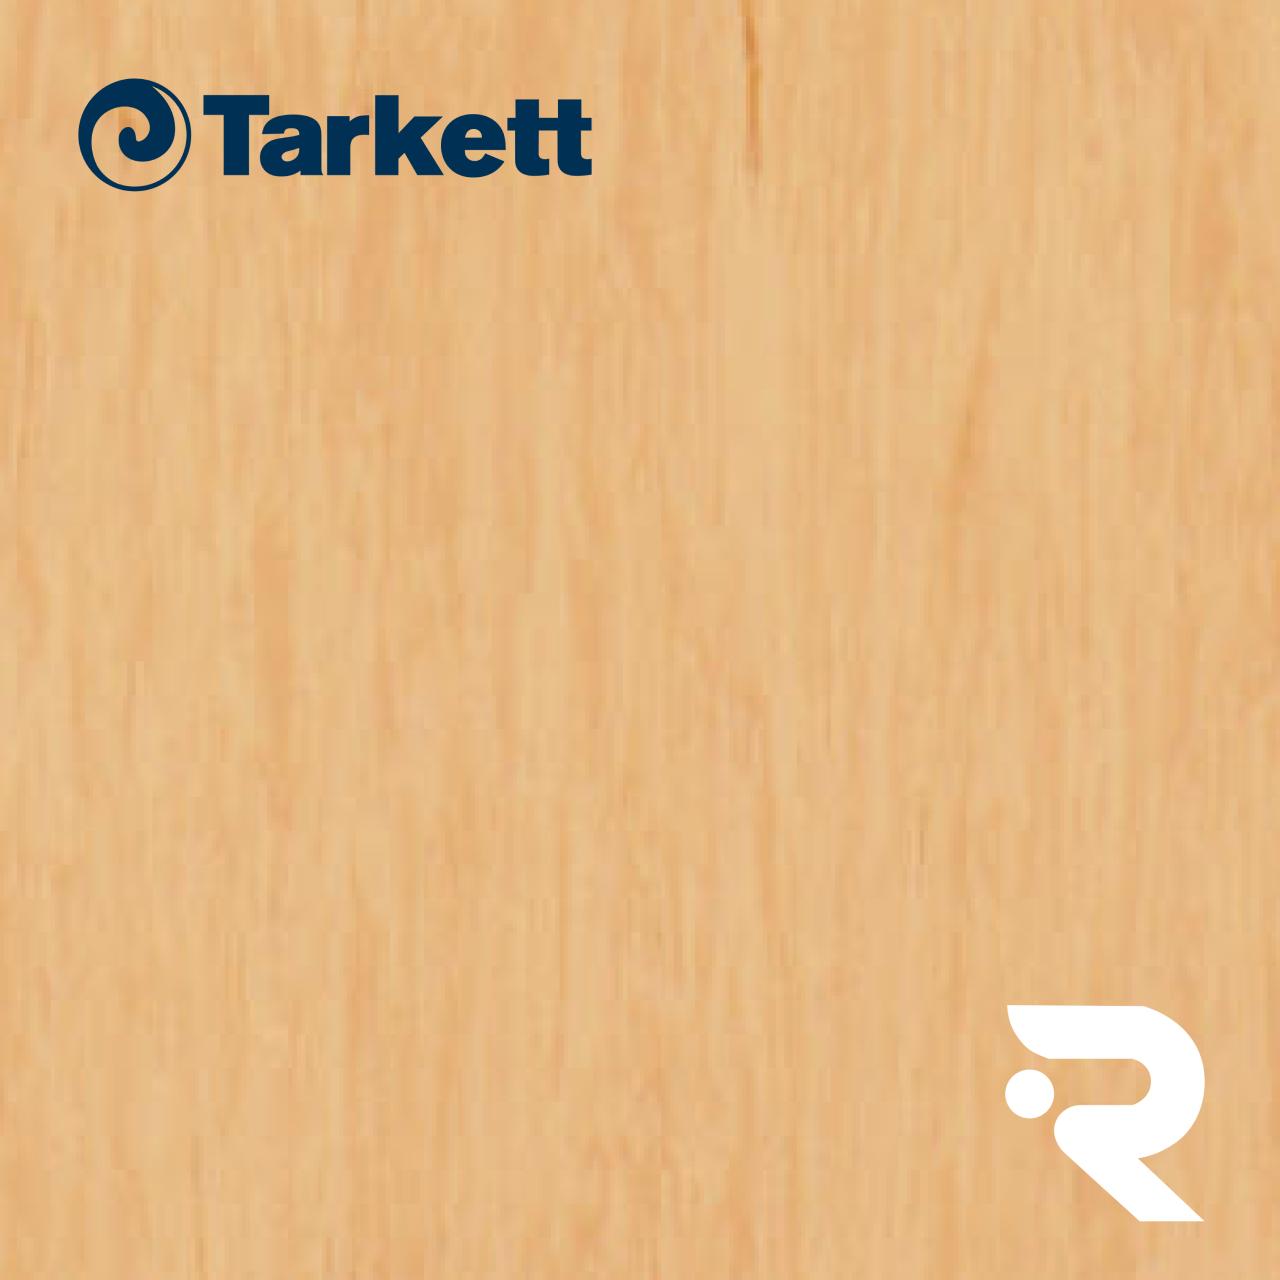 🏫 Гомогенный линолеум Tarkett   Standard YELLOW 0485   Standard Plus 2.0 mm   2 х 23 м